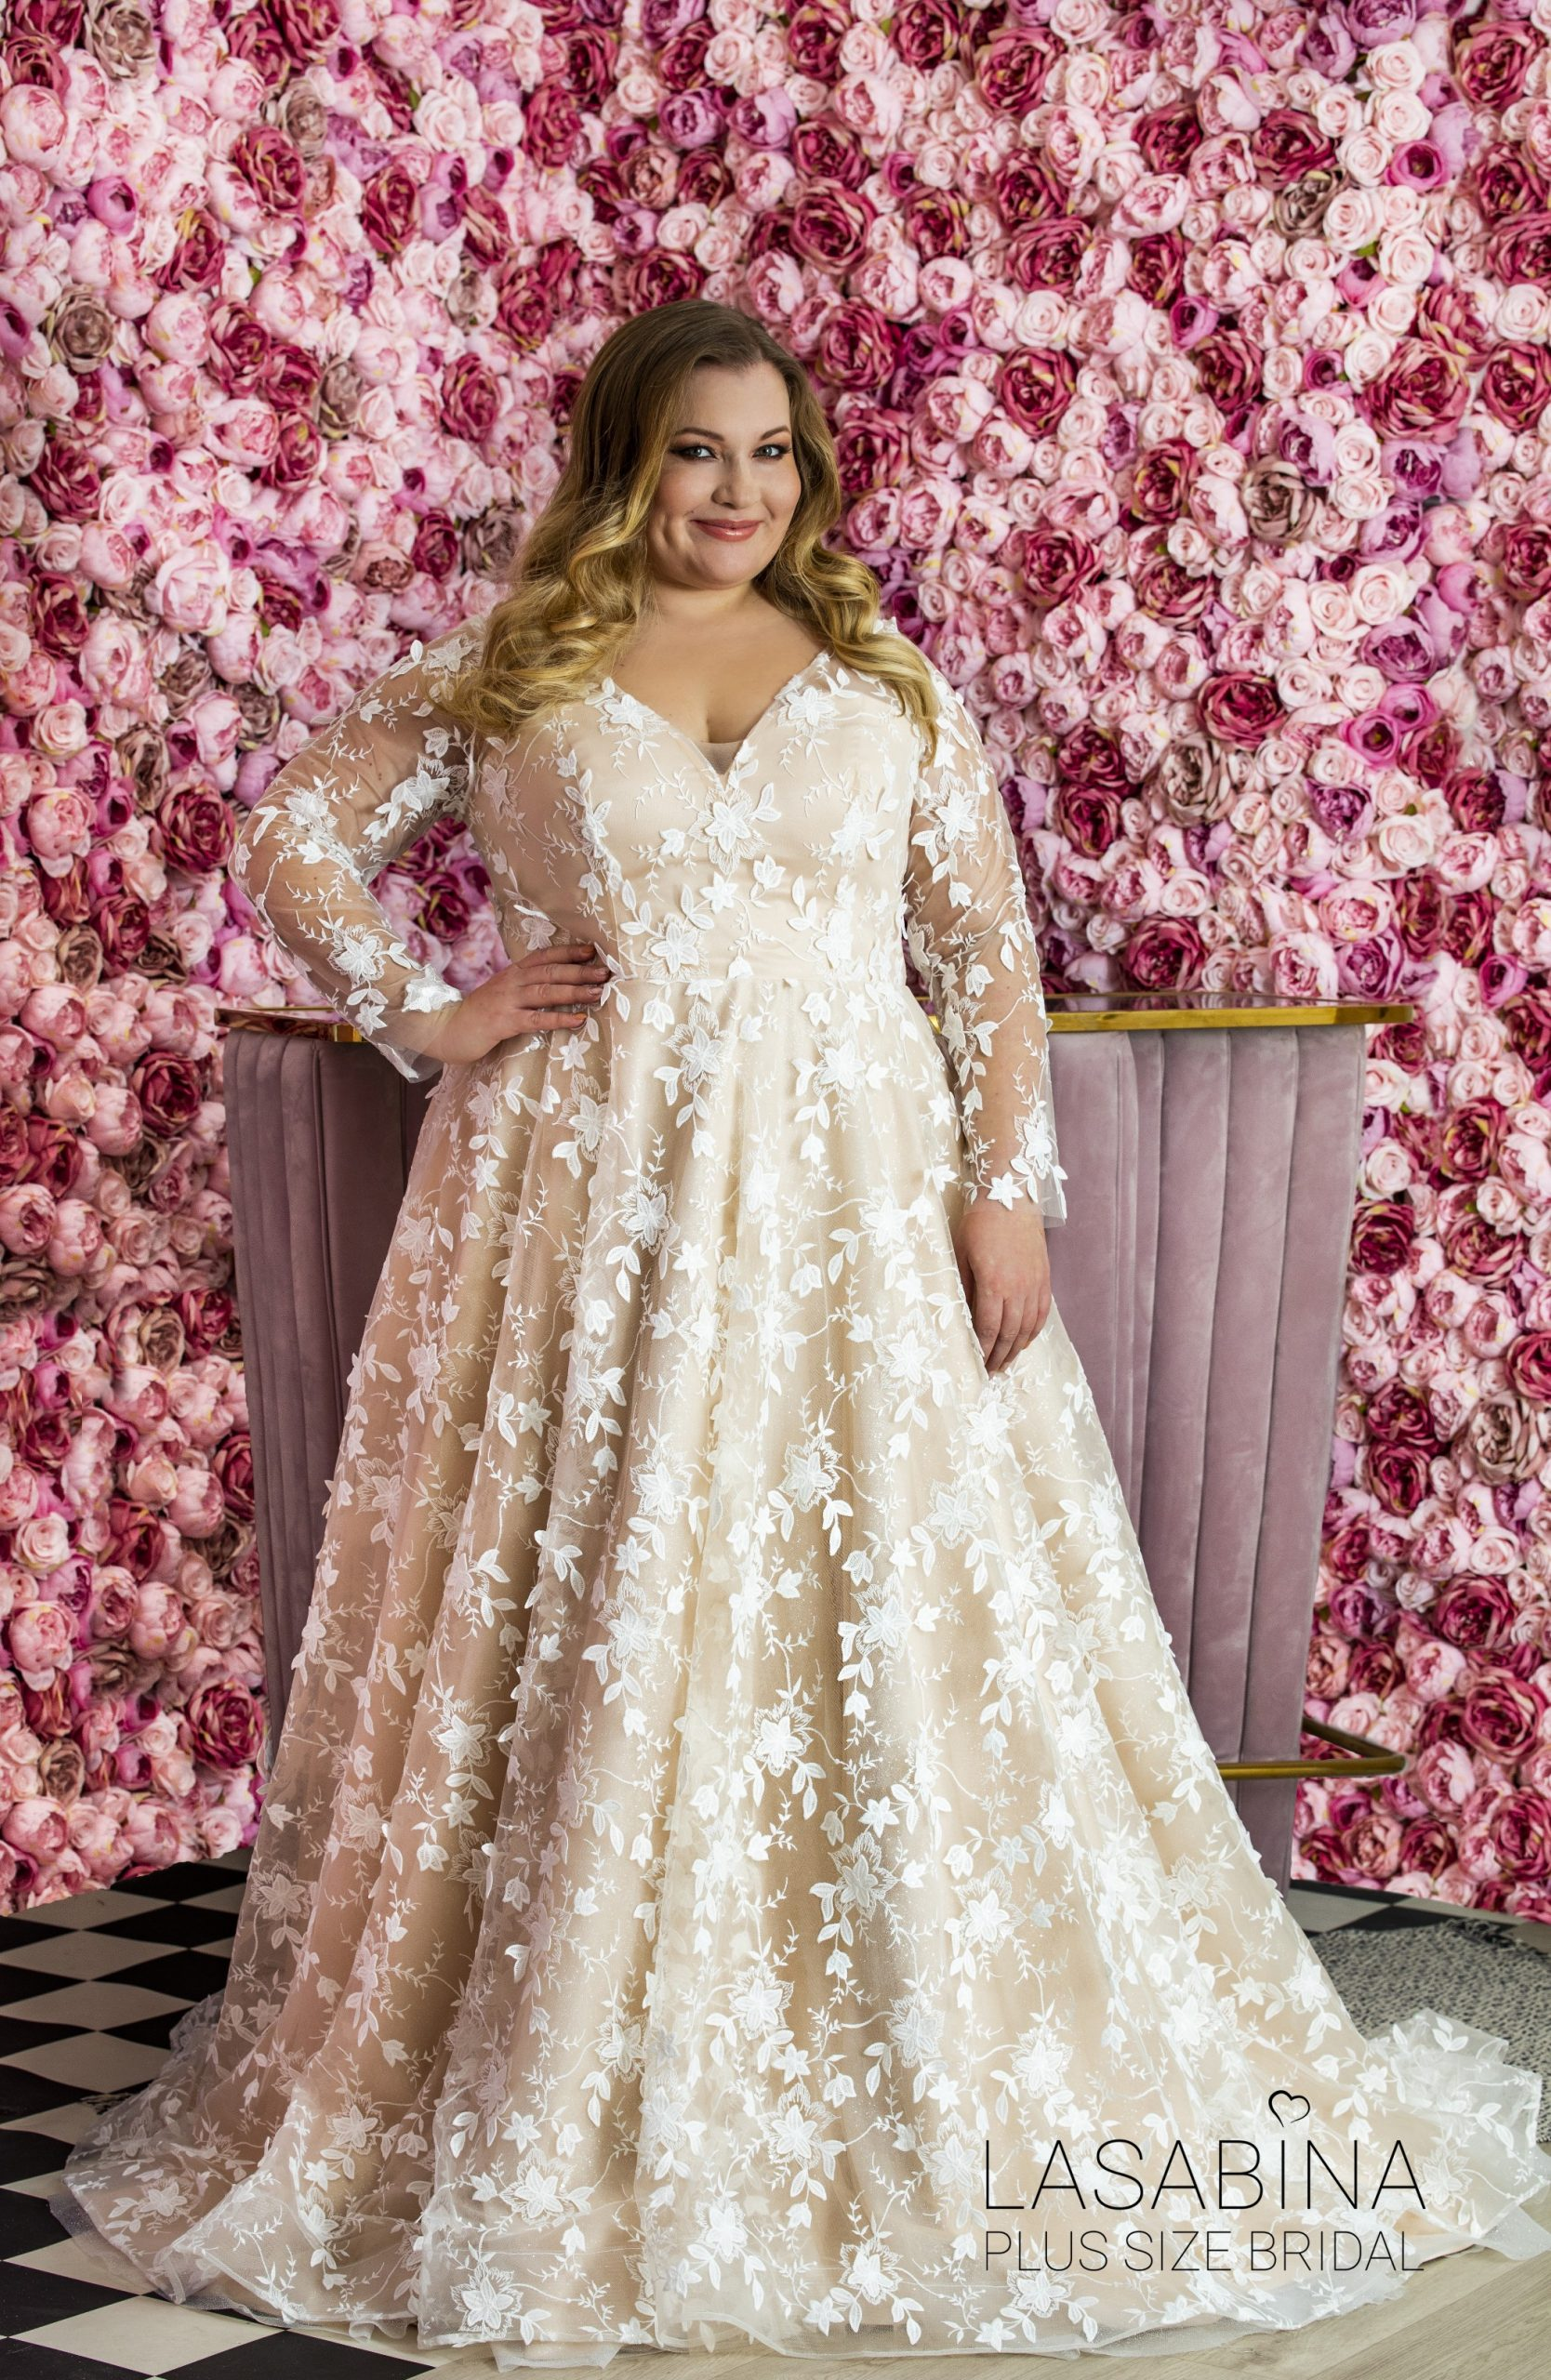 Www Lasabinaplussizebridal Com Wp Content Uploa,Wedding Reception Elegant Plus Size Wedding Guest Dresses